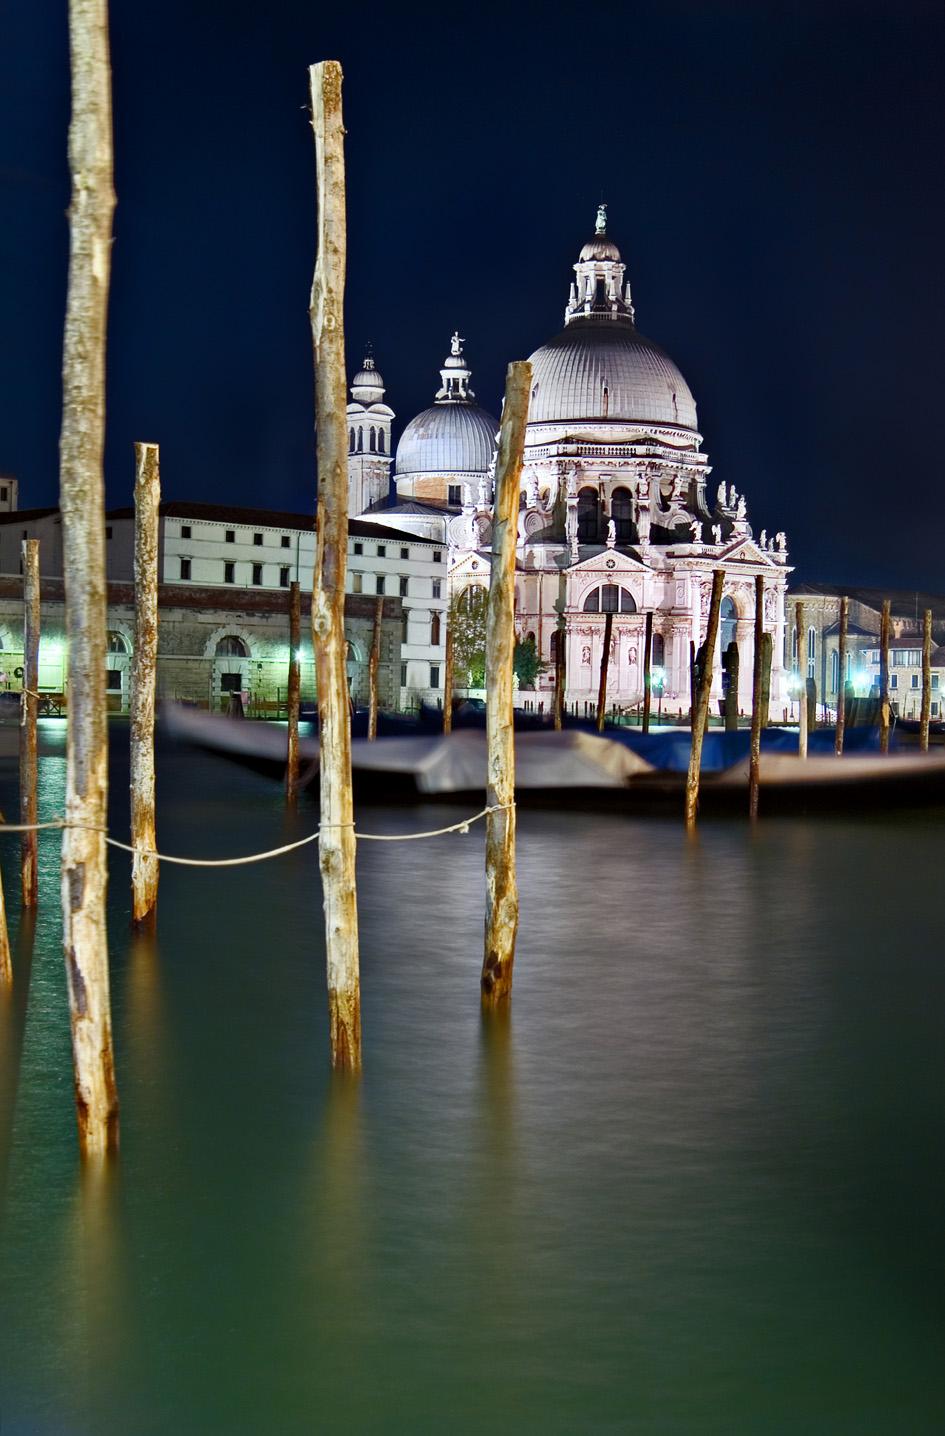 iN VENICE: Santa Maria Salute by night